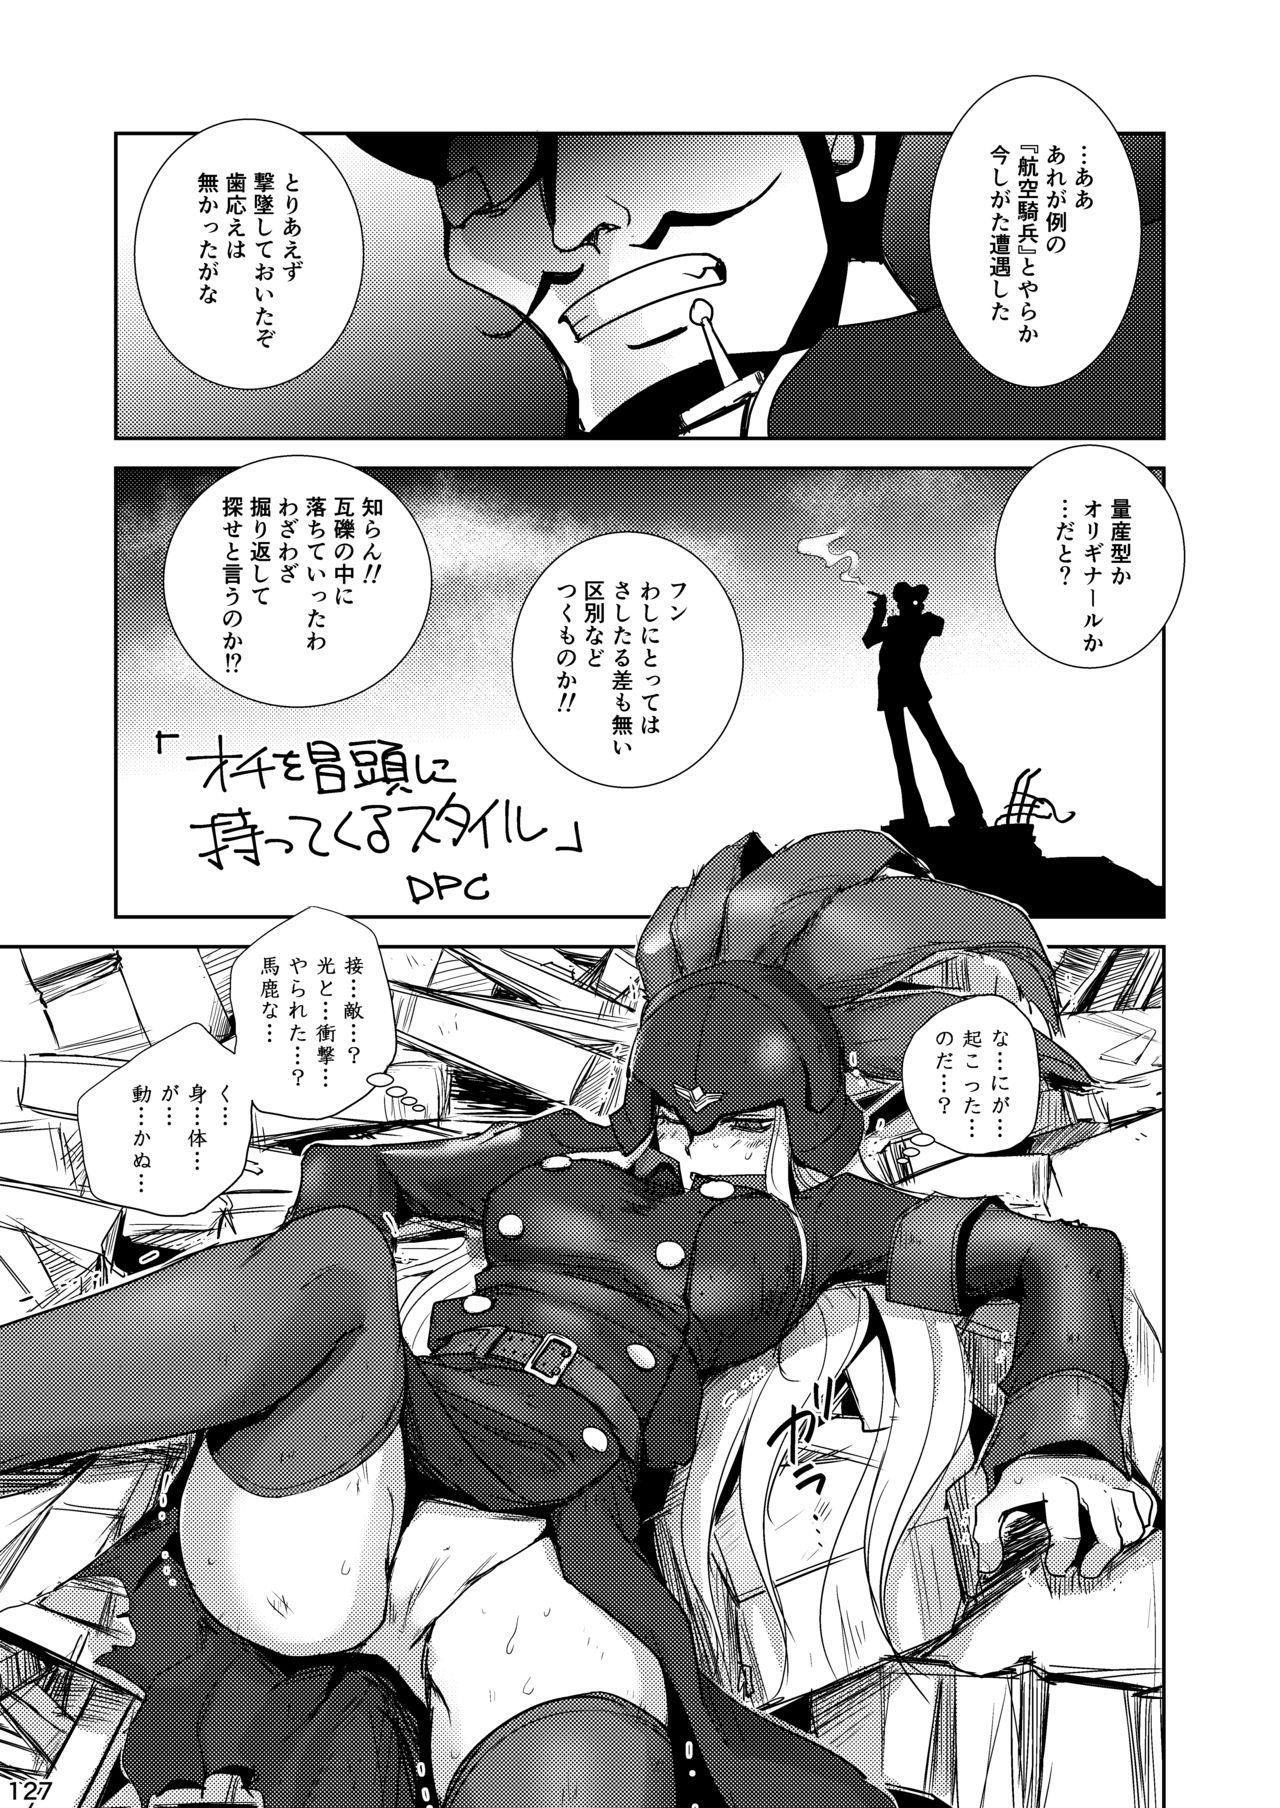 Akatsuki Blitzkampf & EN-1 Perfekt Welt Gangbang Anthology 126